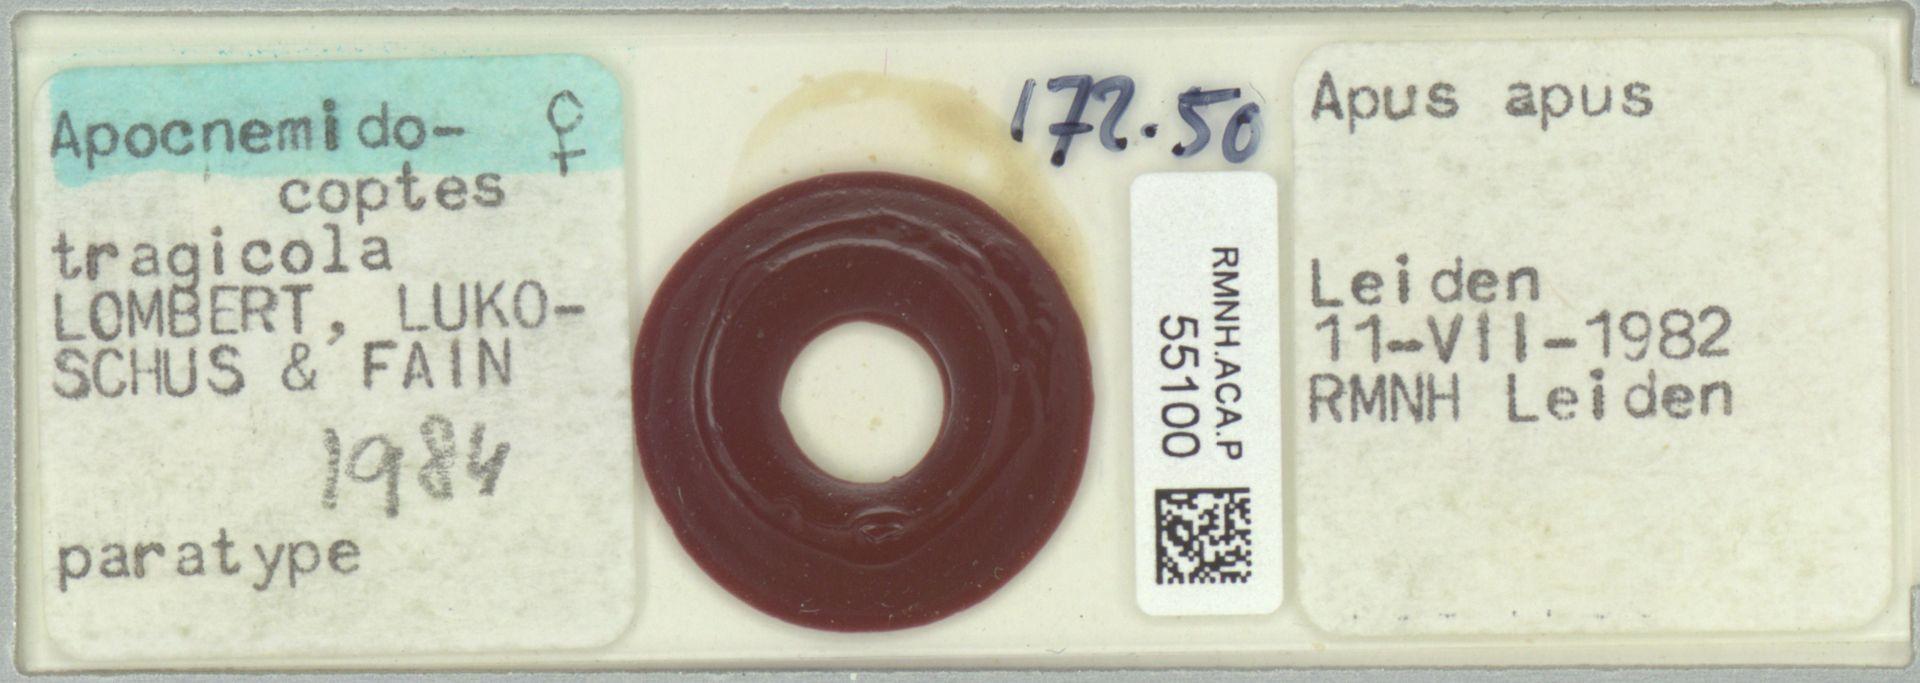 RMNH.ACA.P.55100 | Apocnemidocoptes tragicola Lombert, Lukoschus & Fain 1984